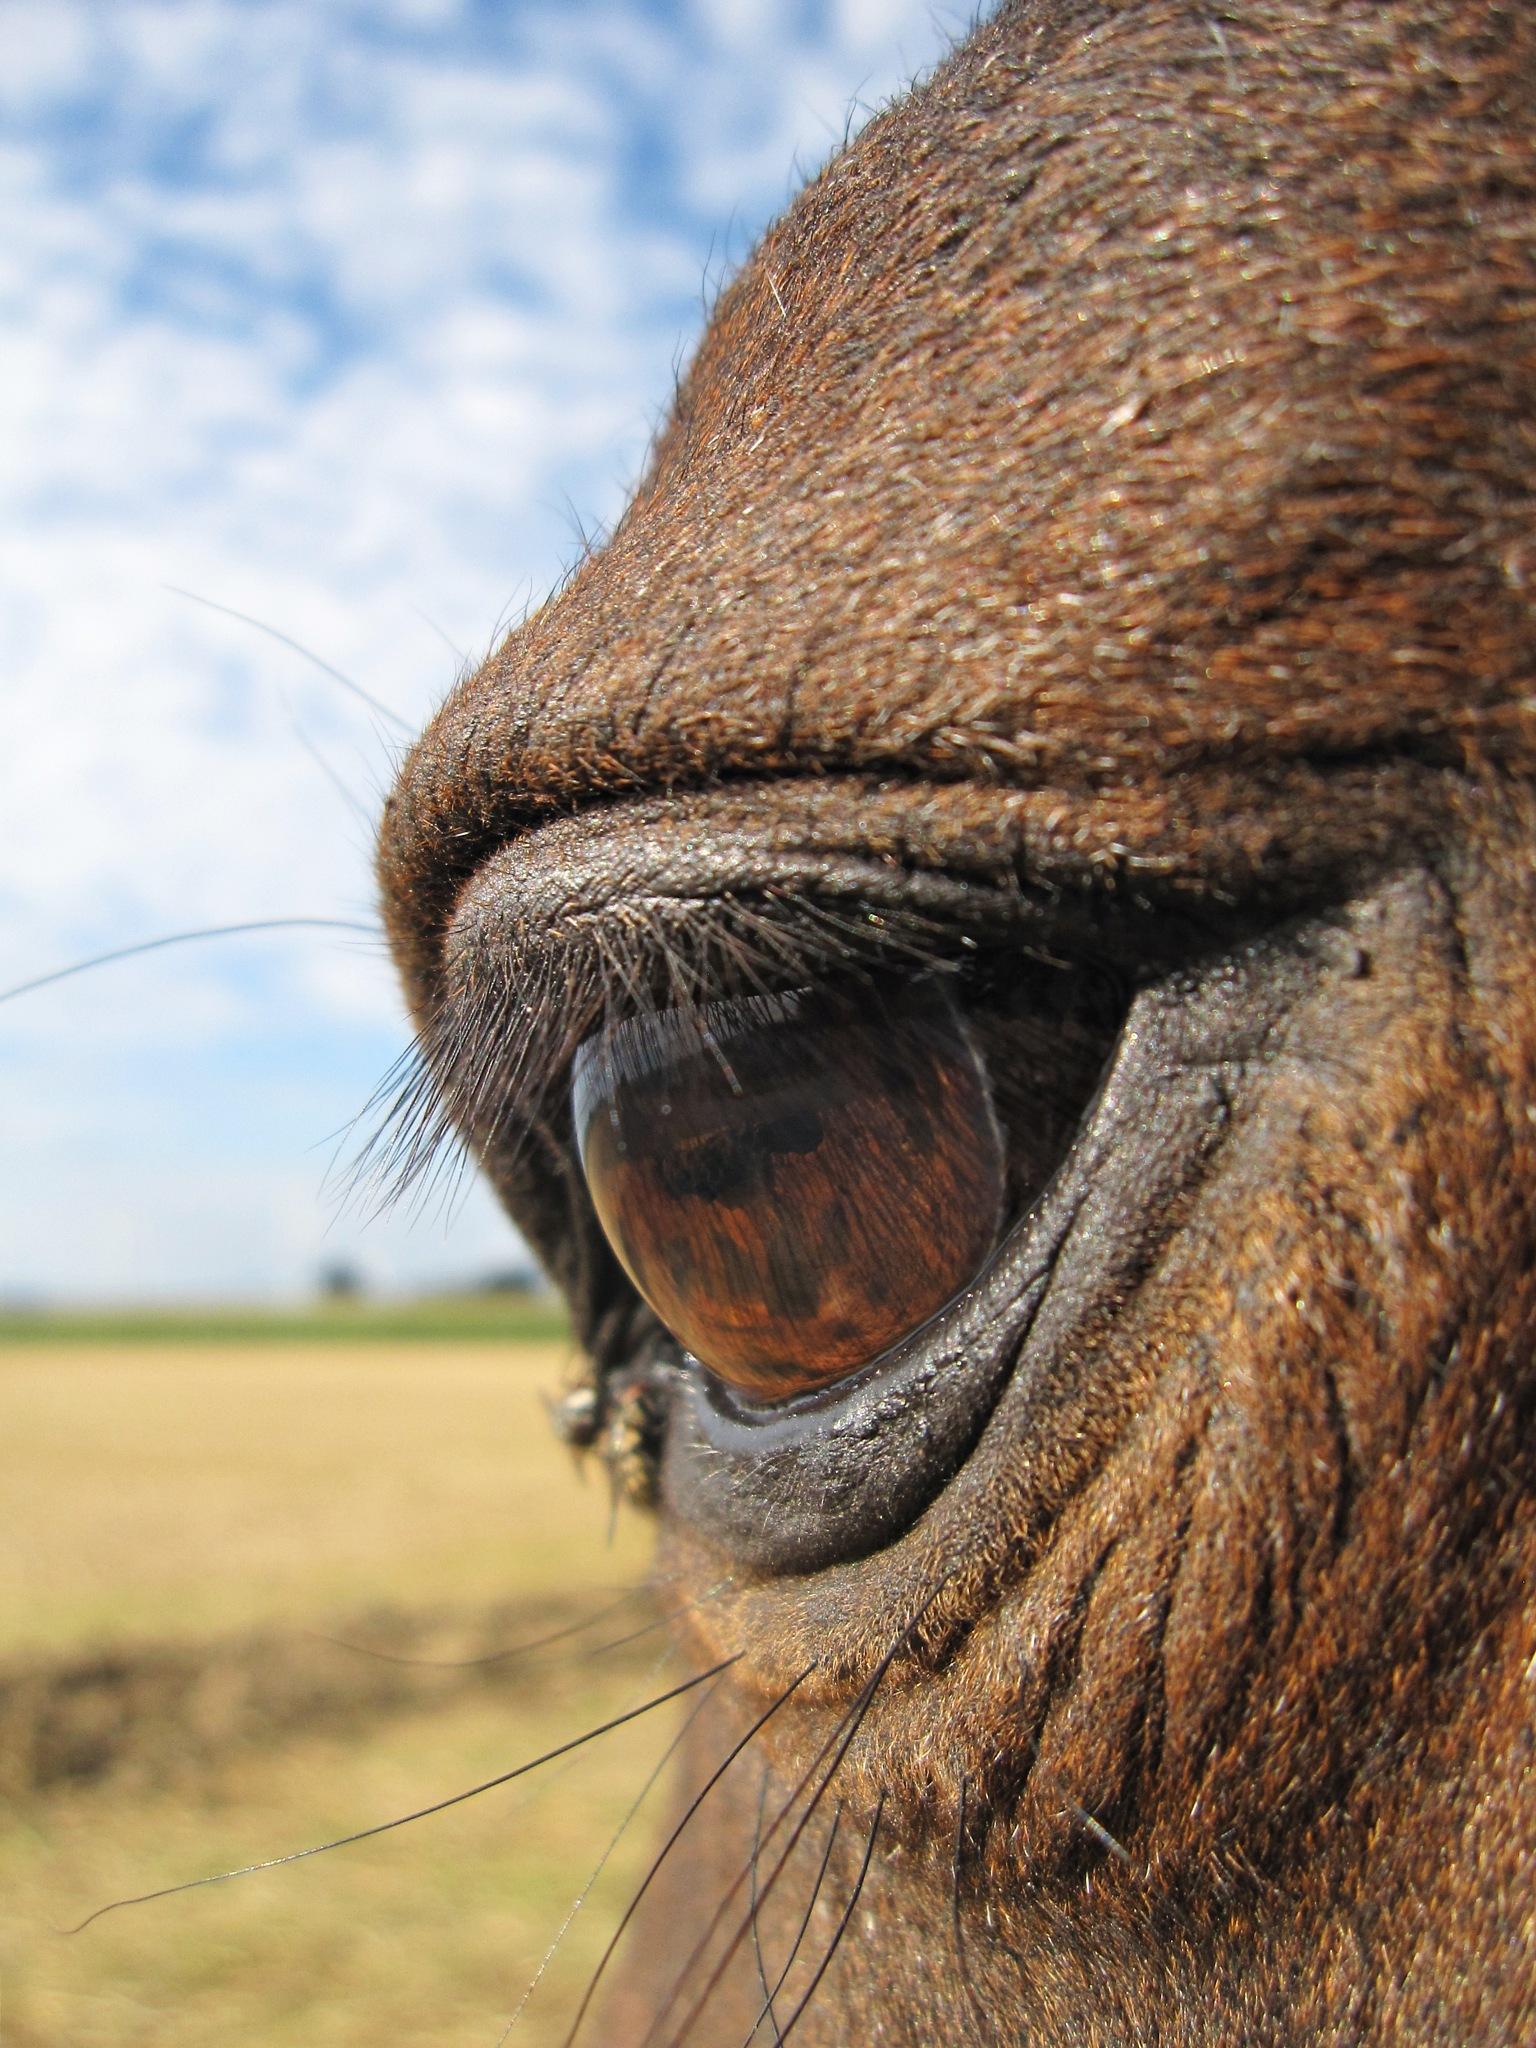 My horse's eye by daretobemad